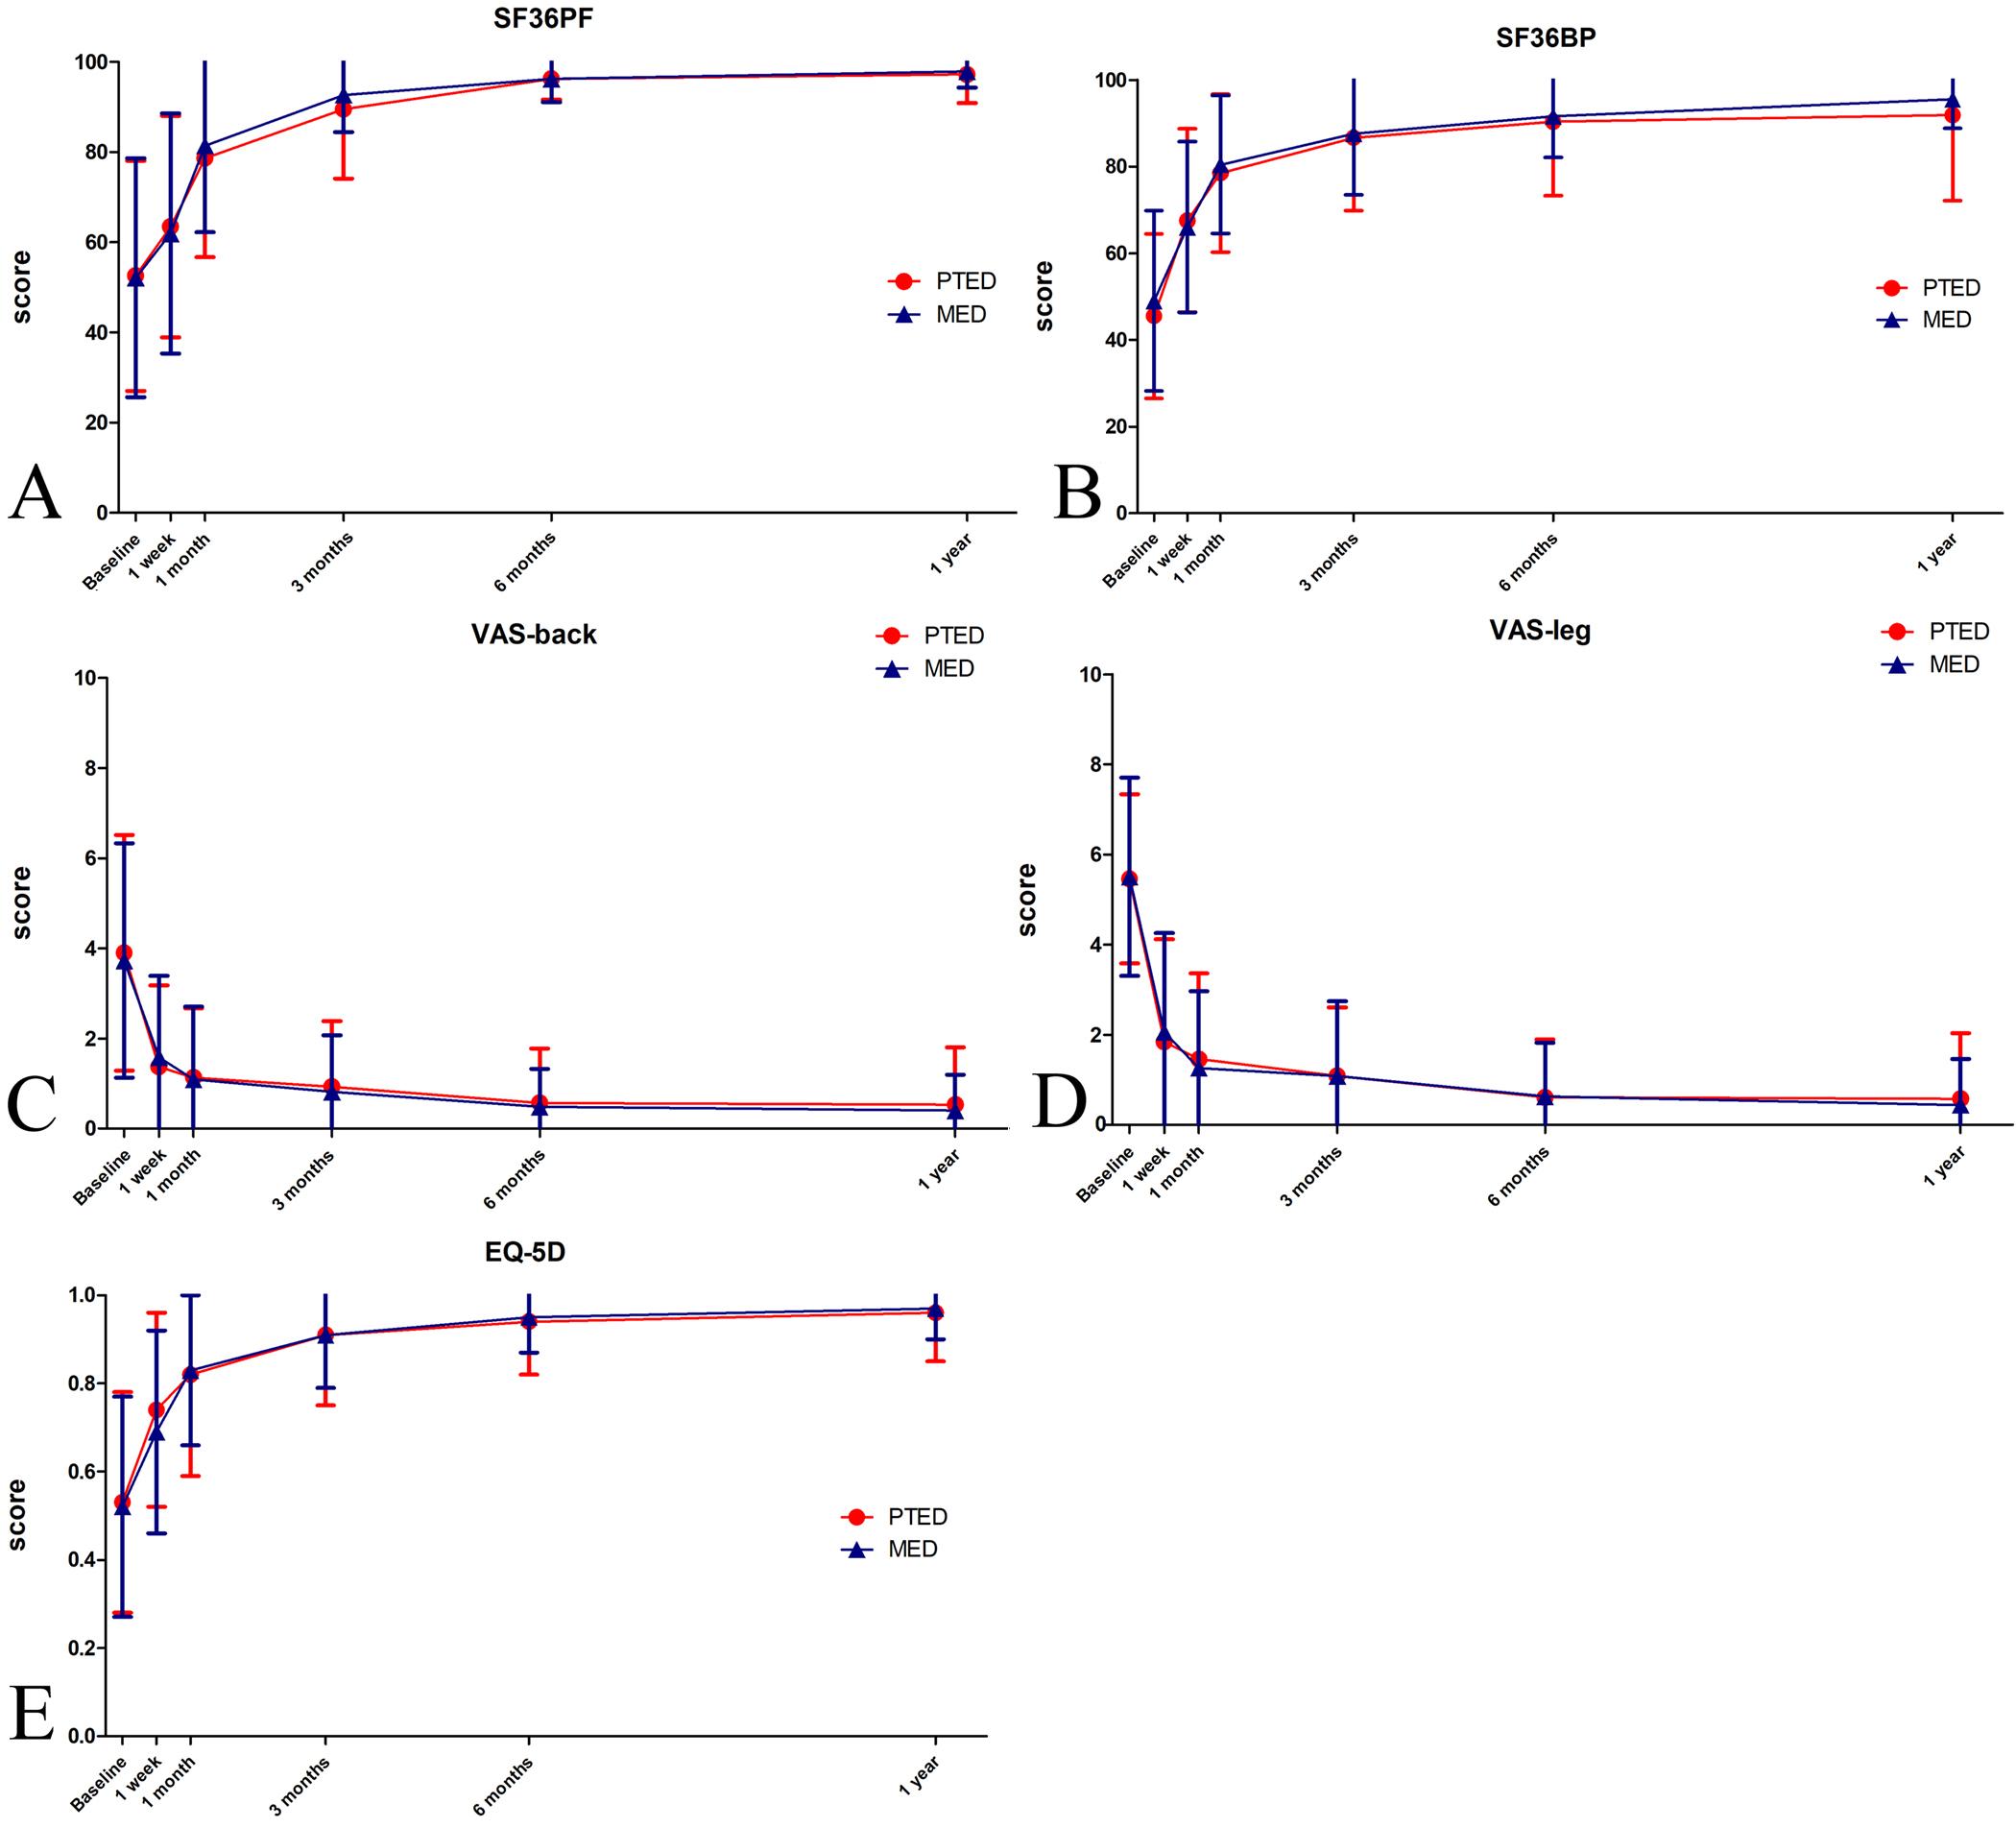 Percutaneous Transforaminal Endoscopic Discectomy Compared With Herman Li Wiring Diagram Fig 3